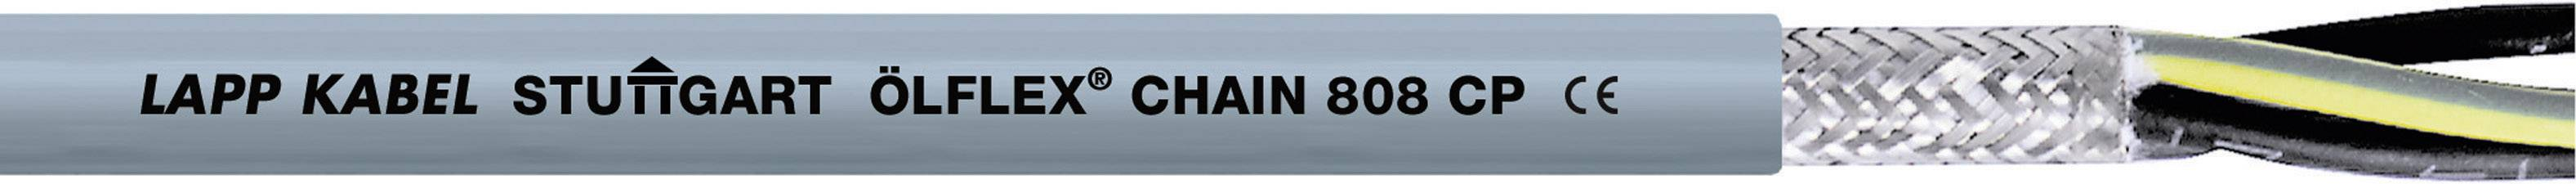 Žíla kabelu LappKabel ÖLFLEX CHAIN 808 CP 7G1,5 (1027779), 7x 1,5 mm², polyurethan, Ø 10,9 mm, stíněný, 50 m,